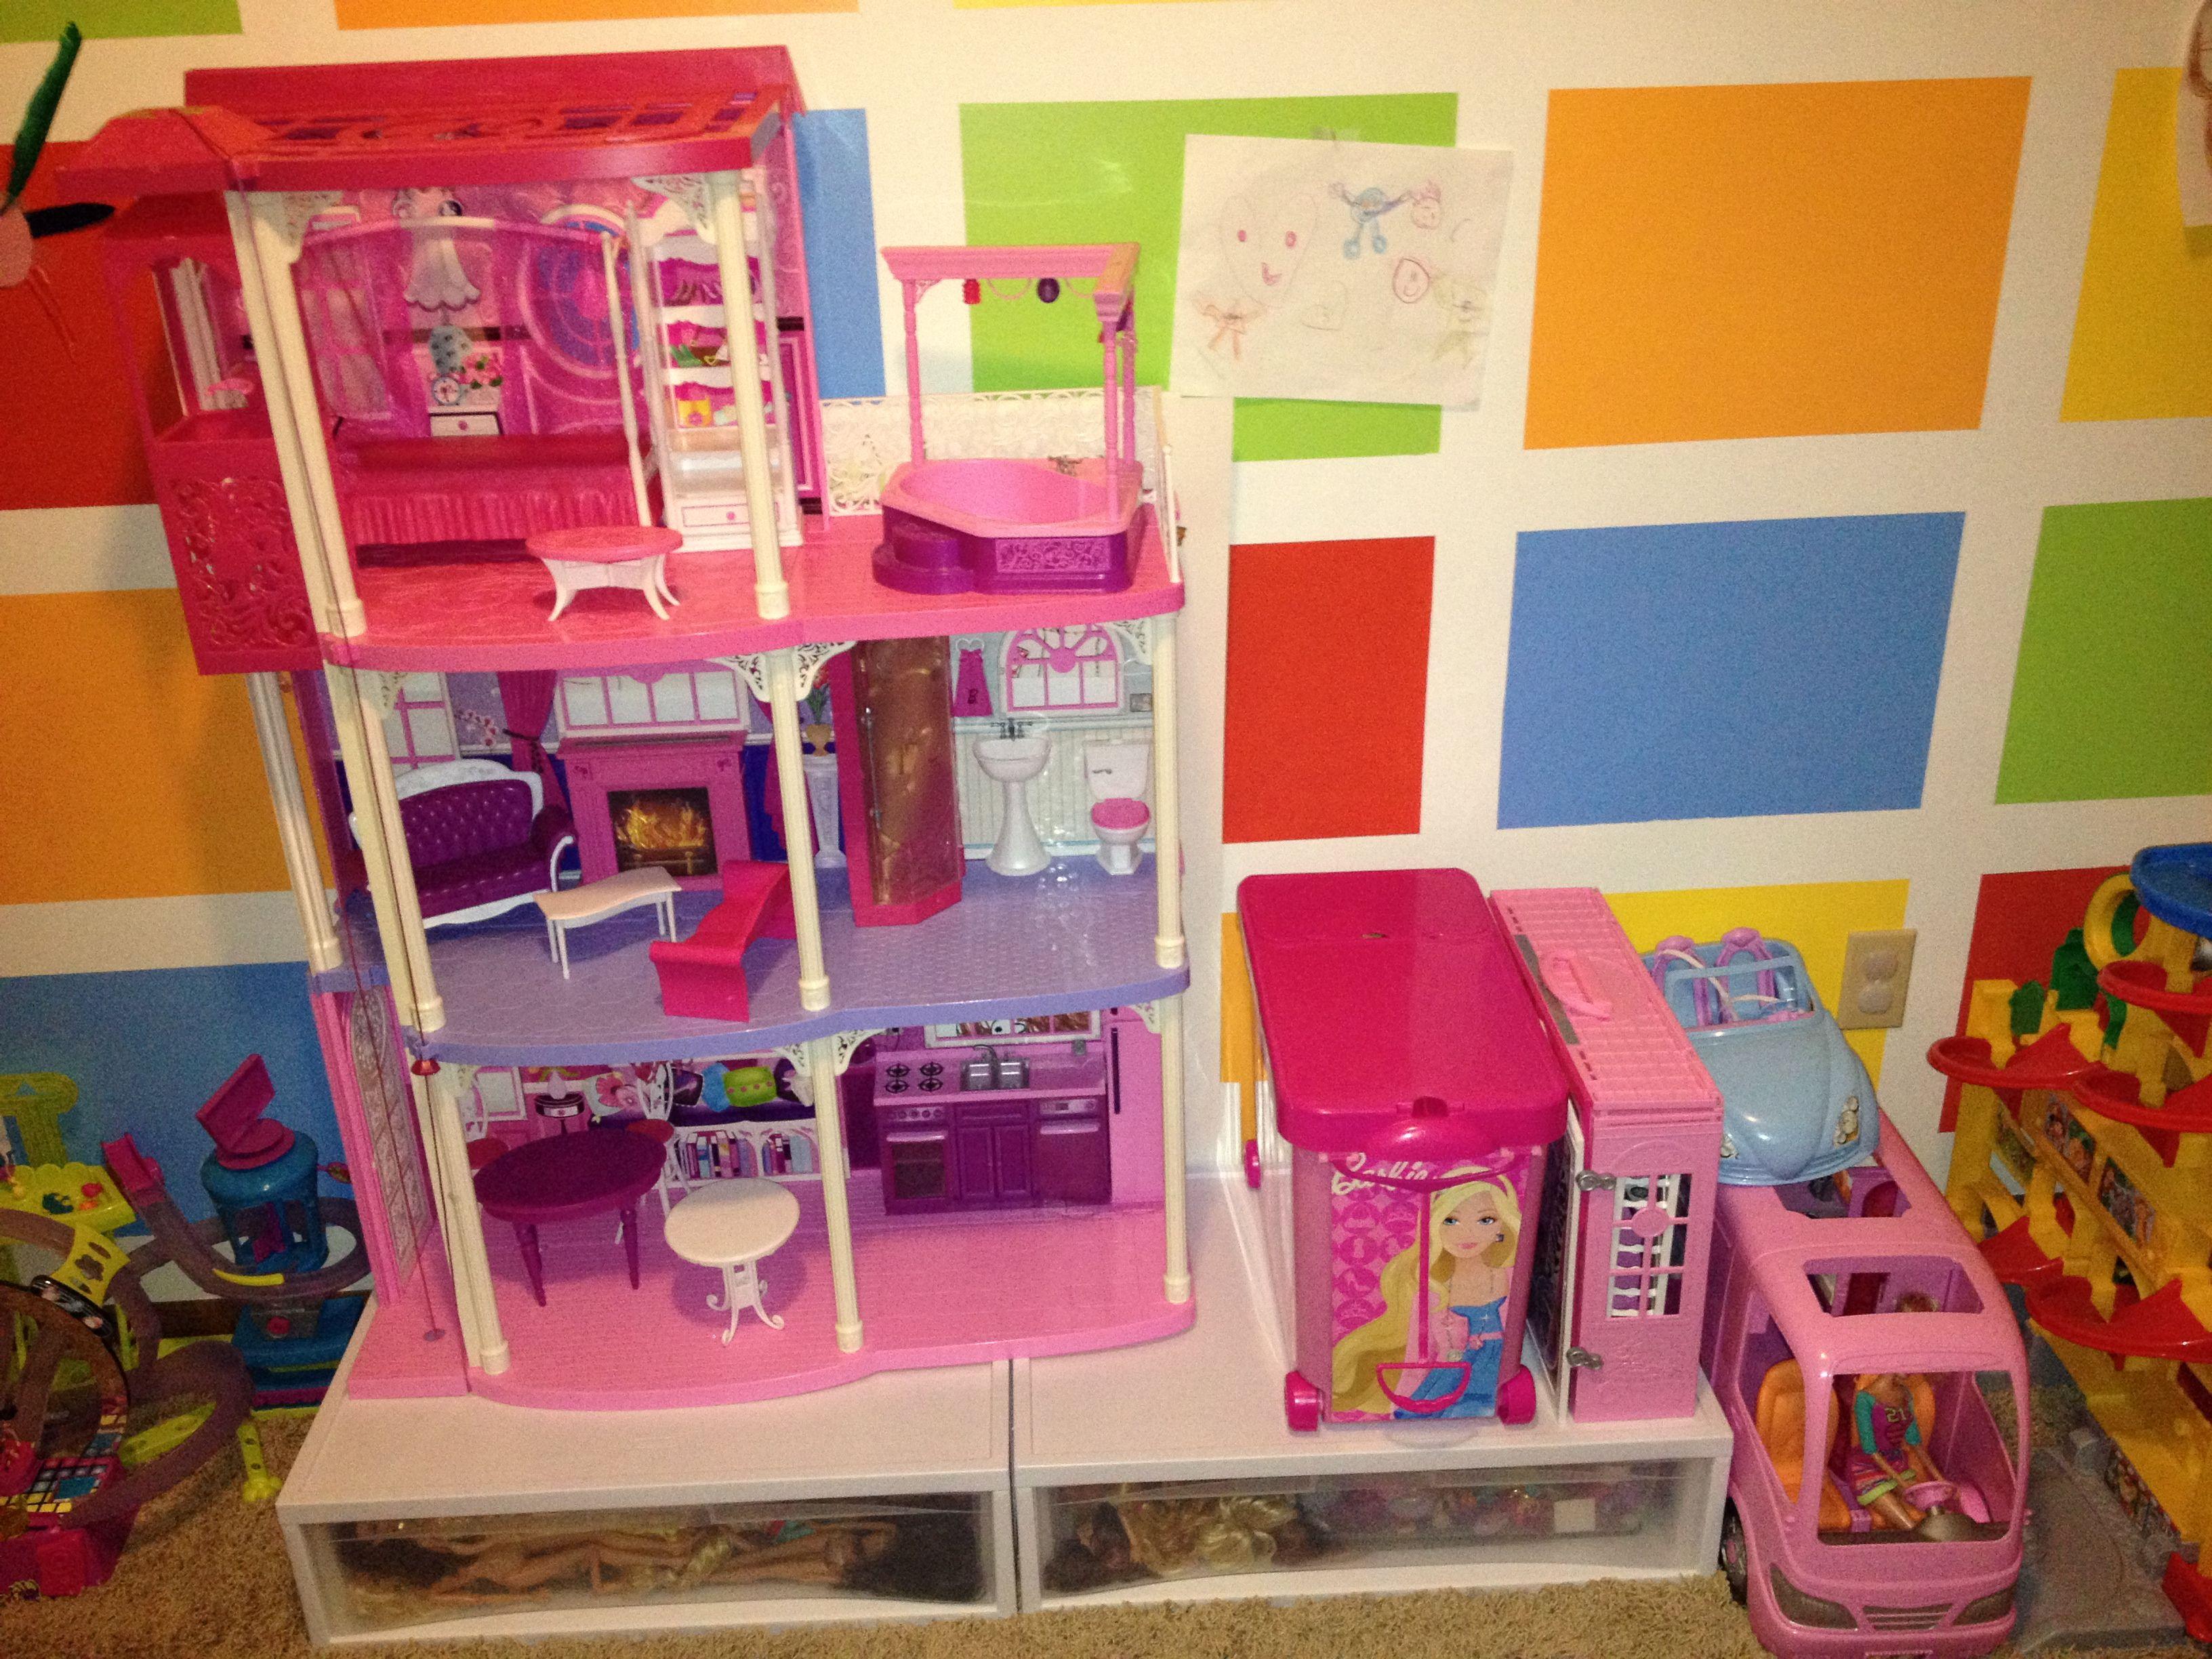 Plastic Storage Drawers Underneath The Barbie Dream House